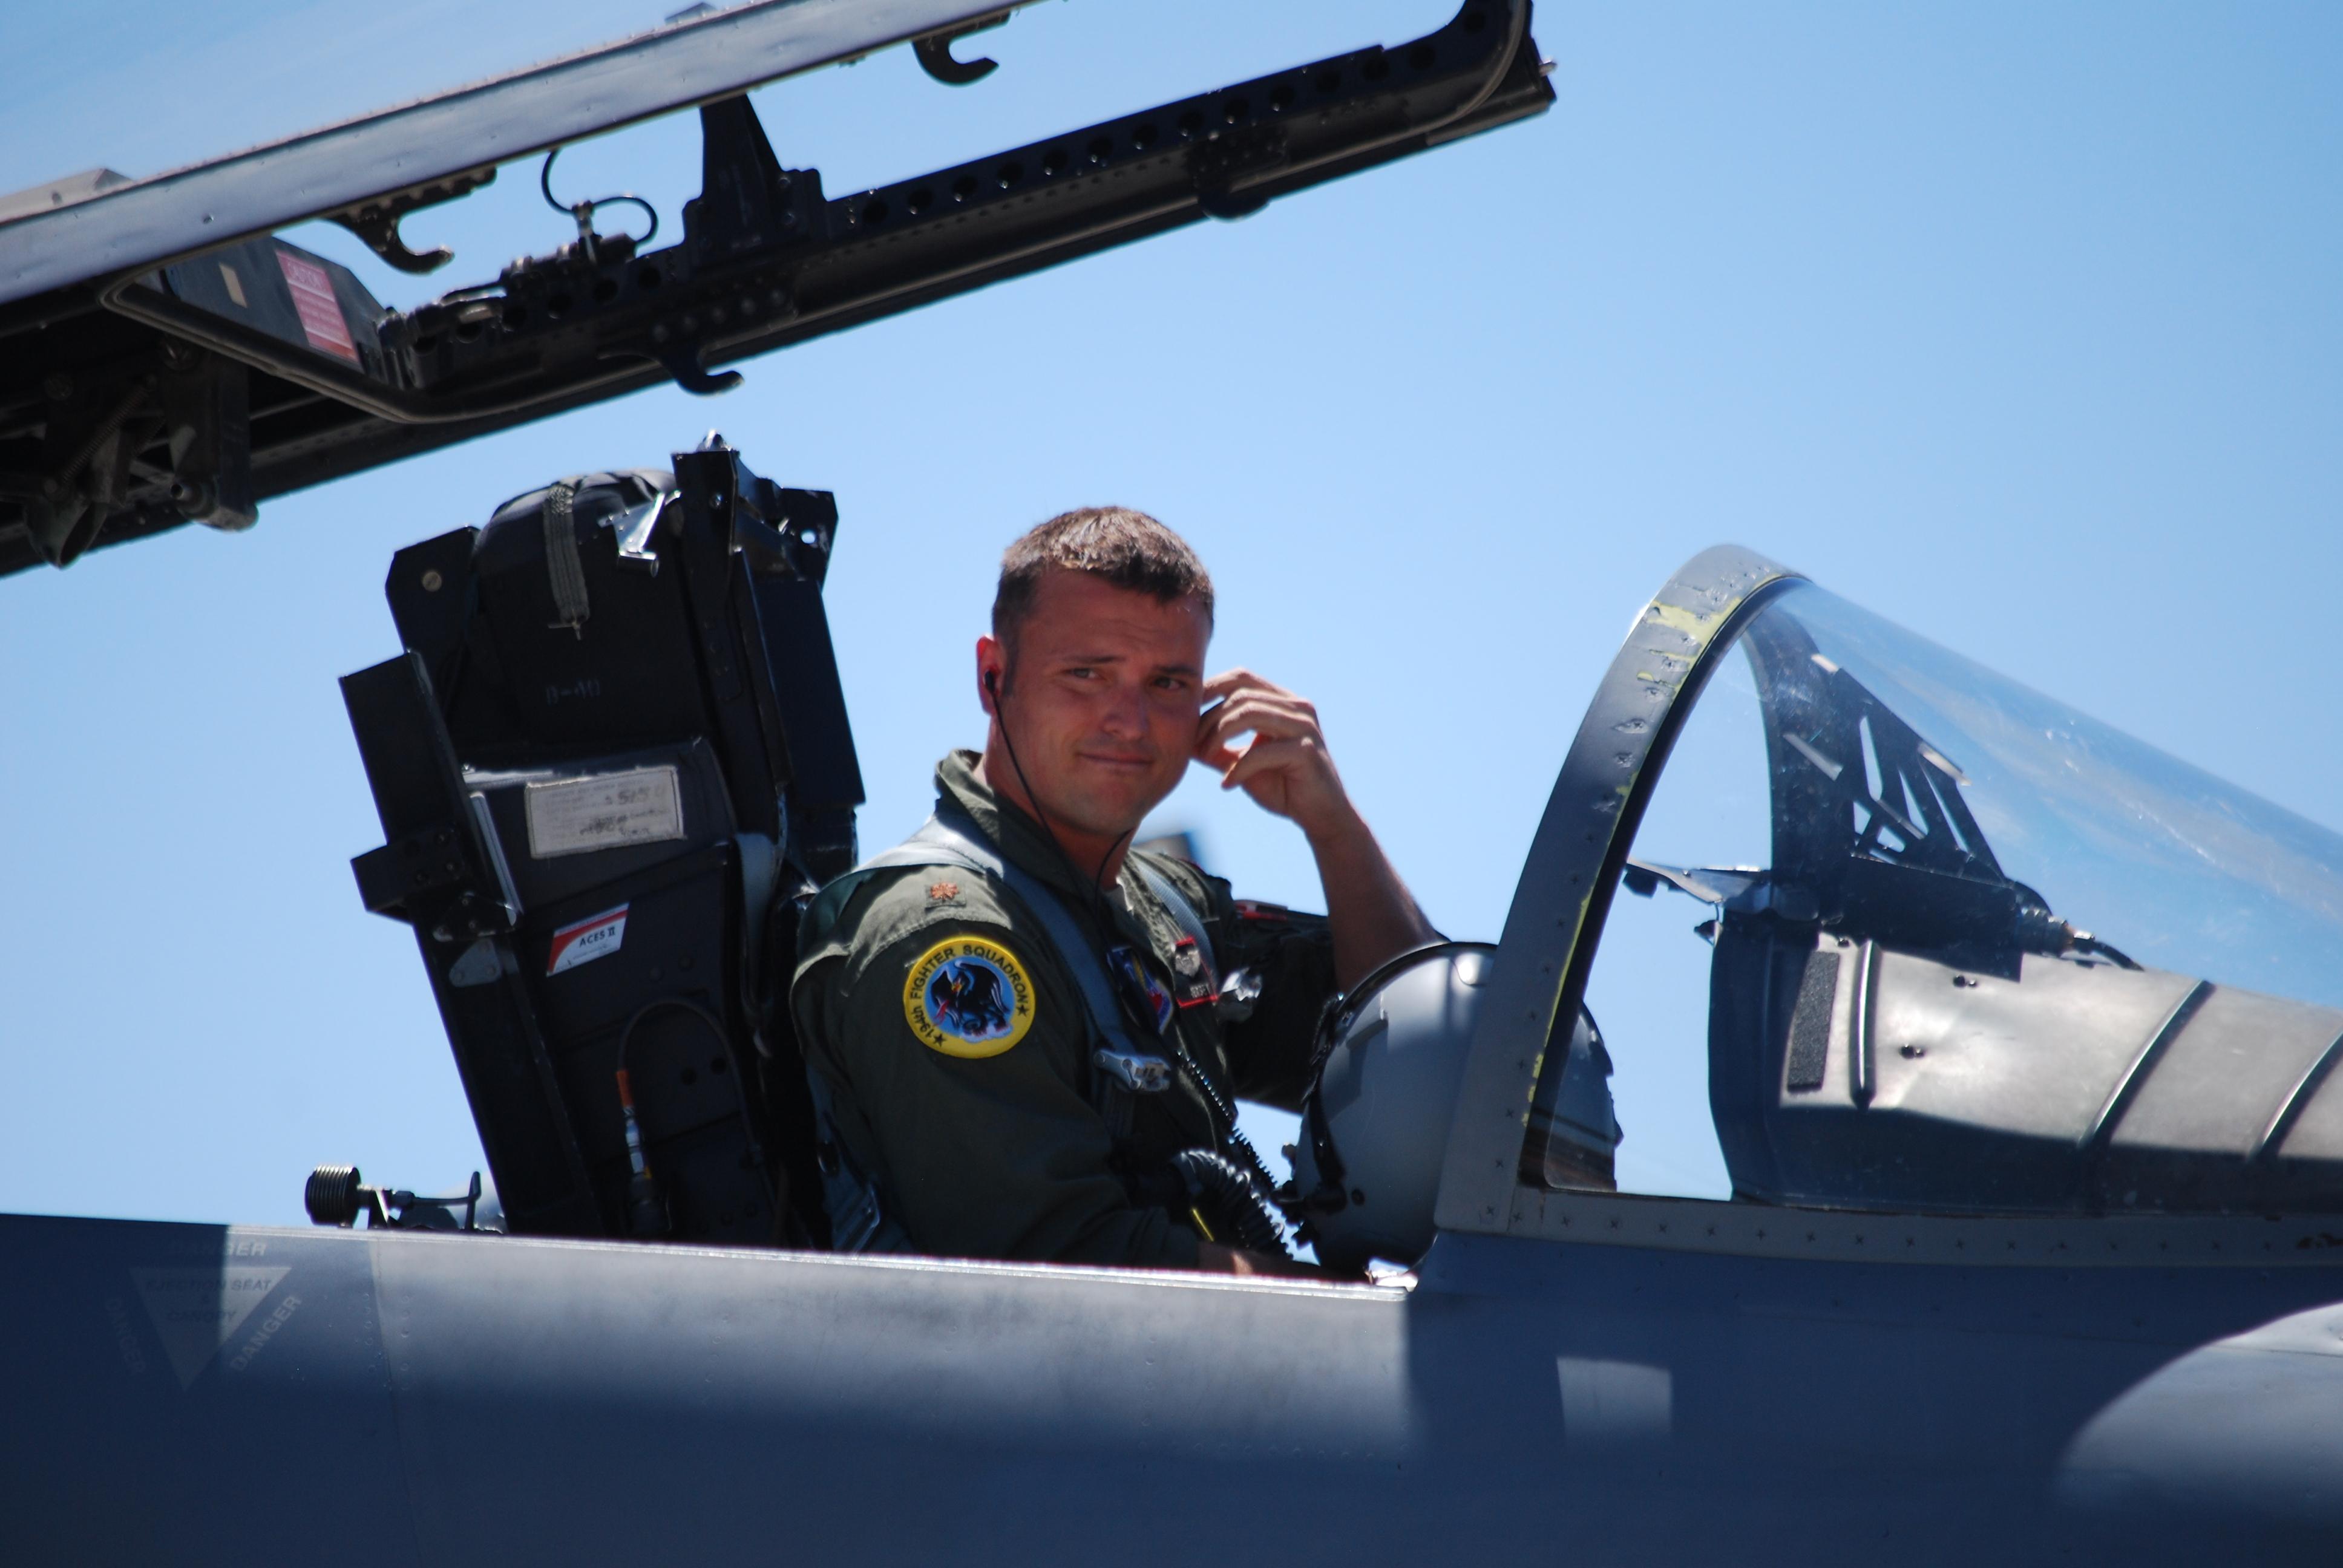 F 15 Cockpit File:U.S. Air Force Ma...